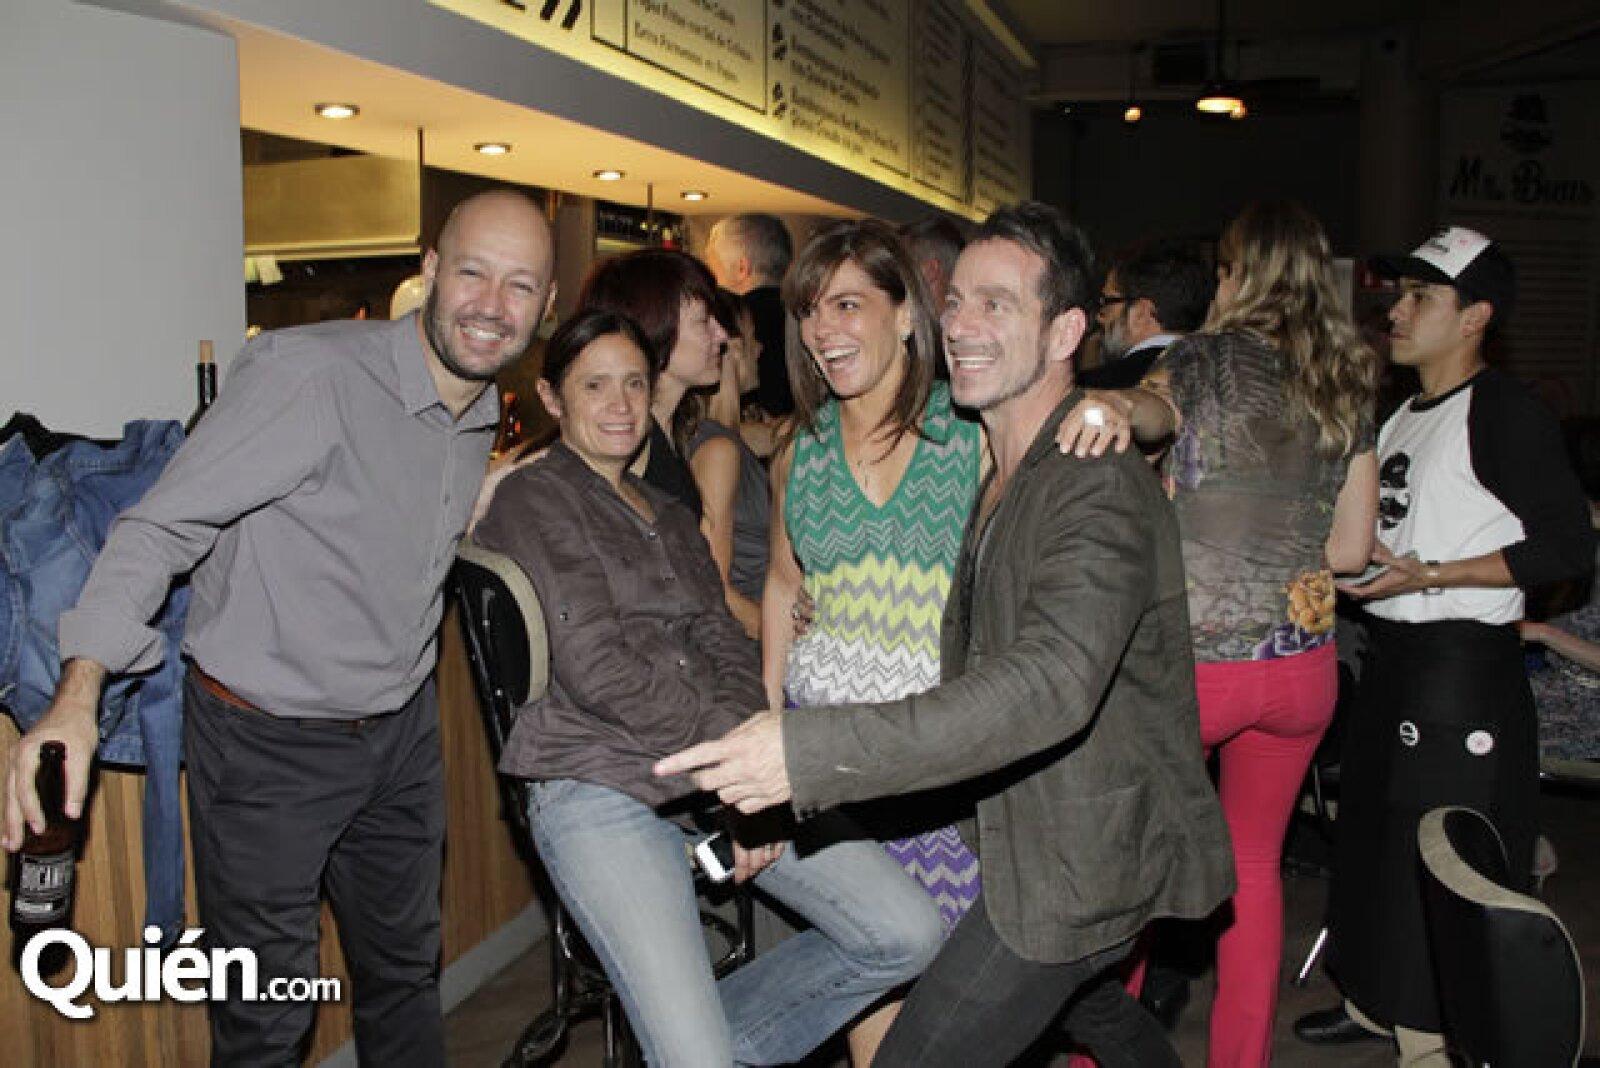 José Castillo,Saidee Springalall,Lara Becerra,Paola Ruíz,Michel Rojkind,Rocío Pizarro